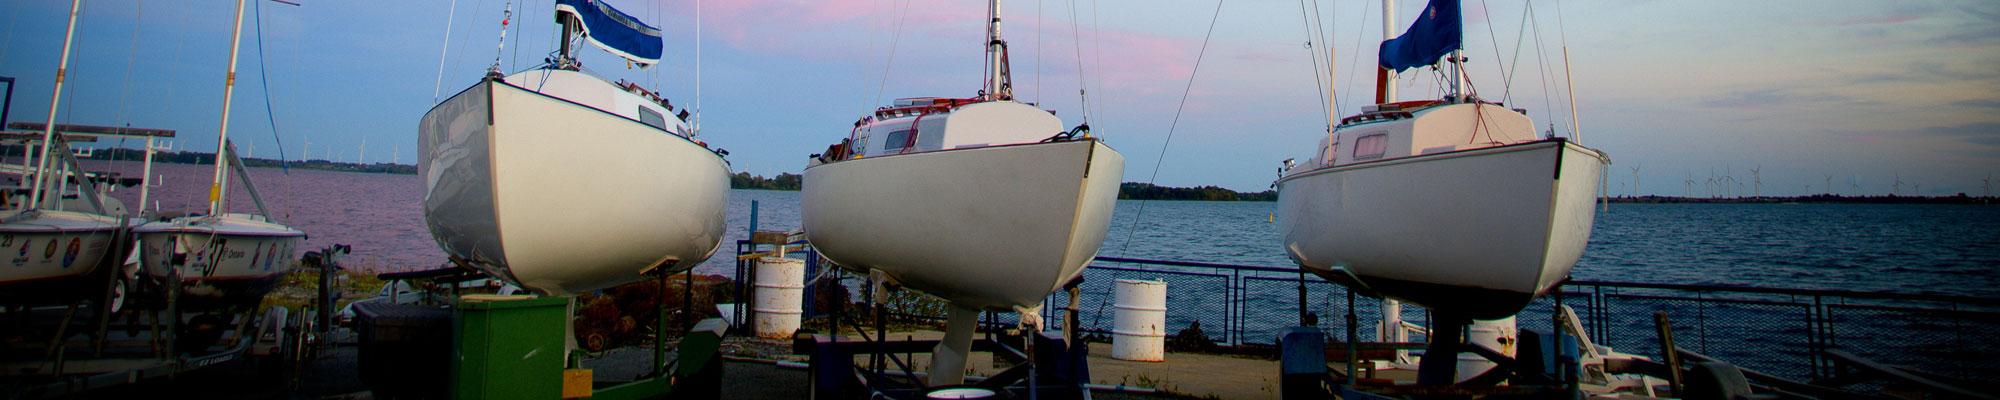 Kingston Summer Camp Sailing Lessons | Kingston Yacht Club